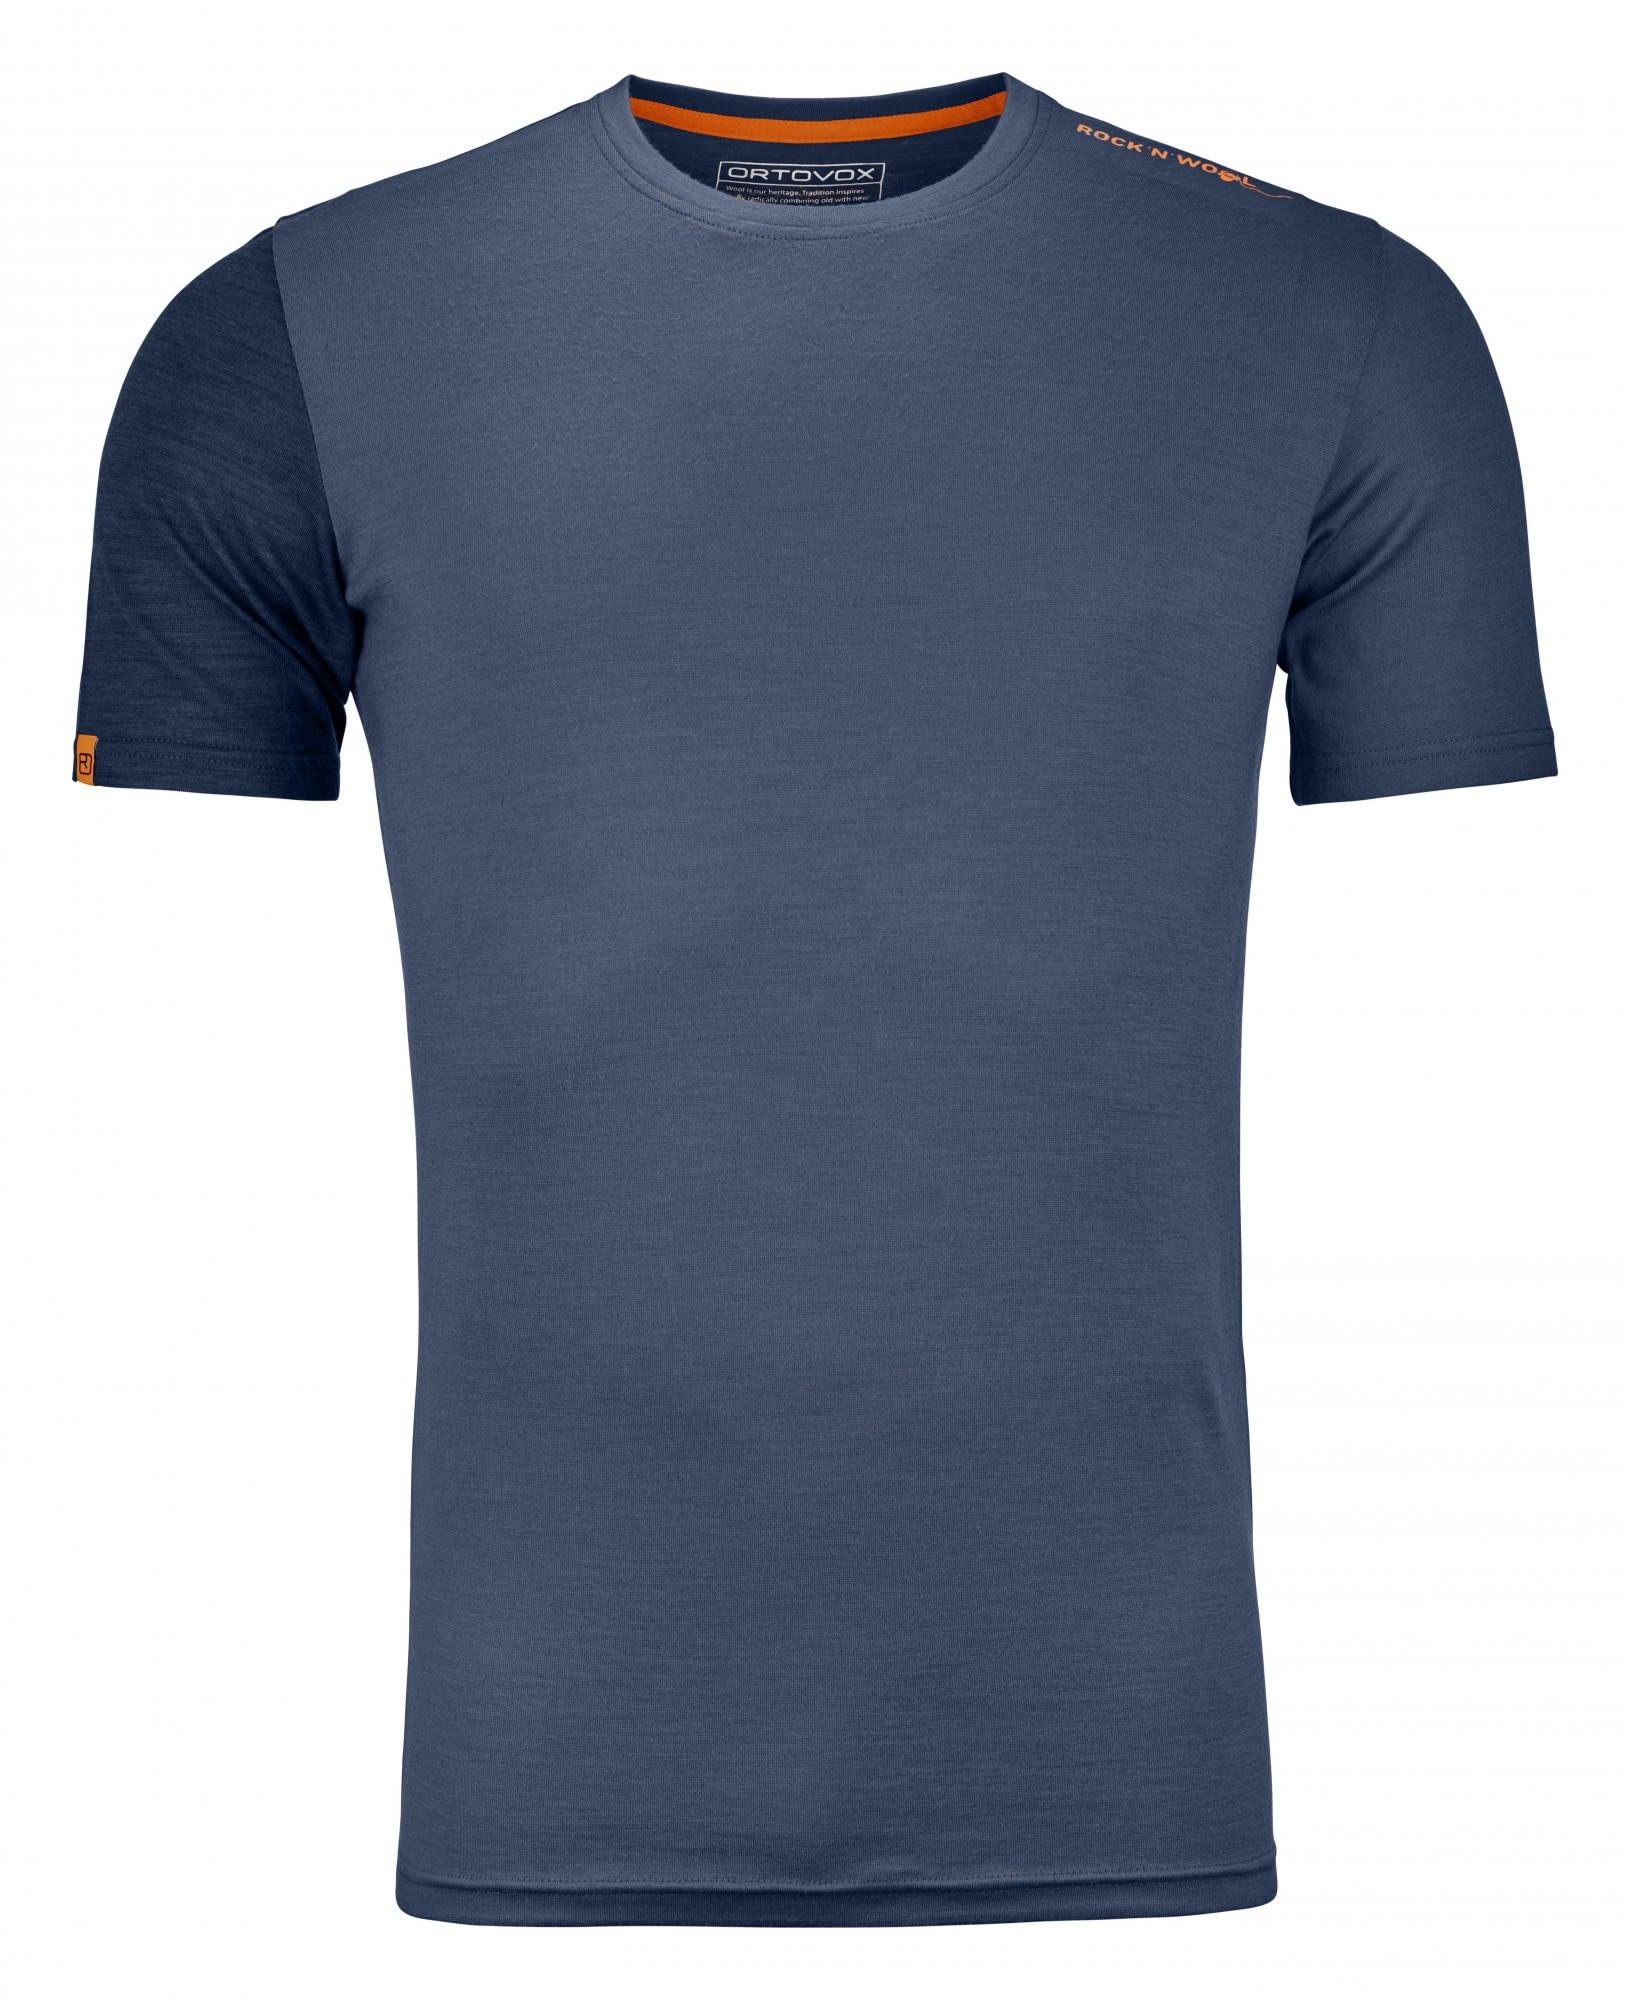 Ortovox 185 Merino Rock'n'wool Short Sleeve Blau, Male Merino Kurzarm-Shirt, L